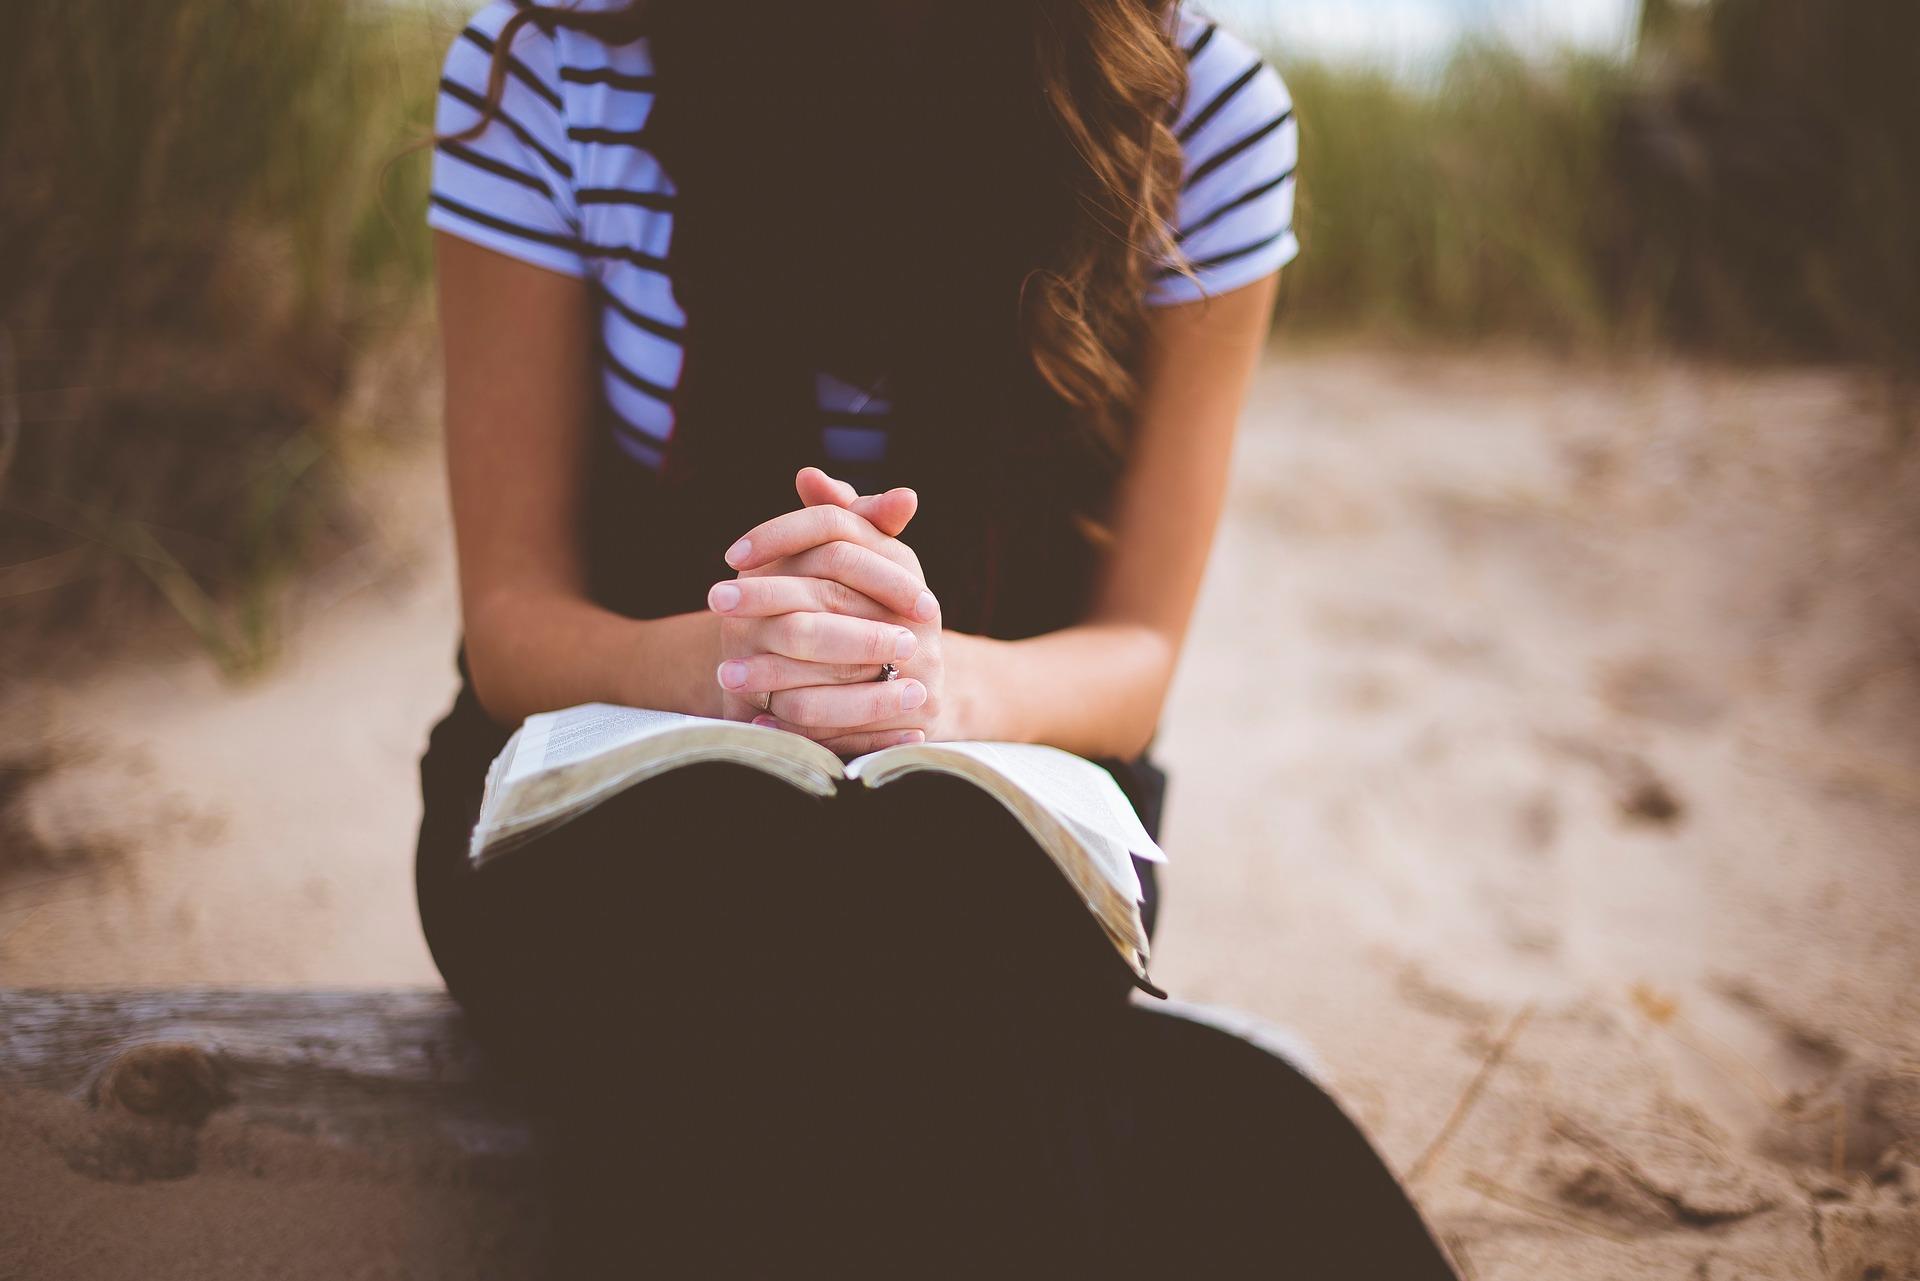 girl folded hands on Bible